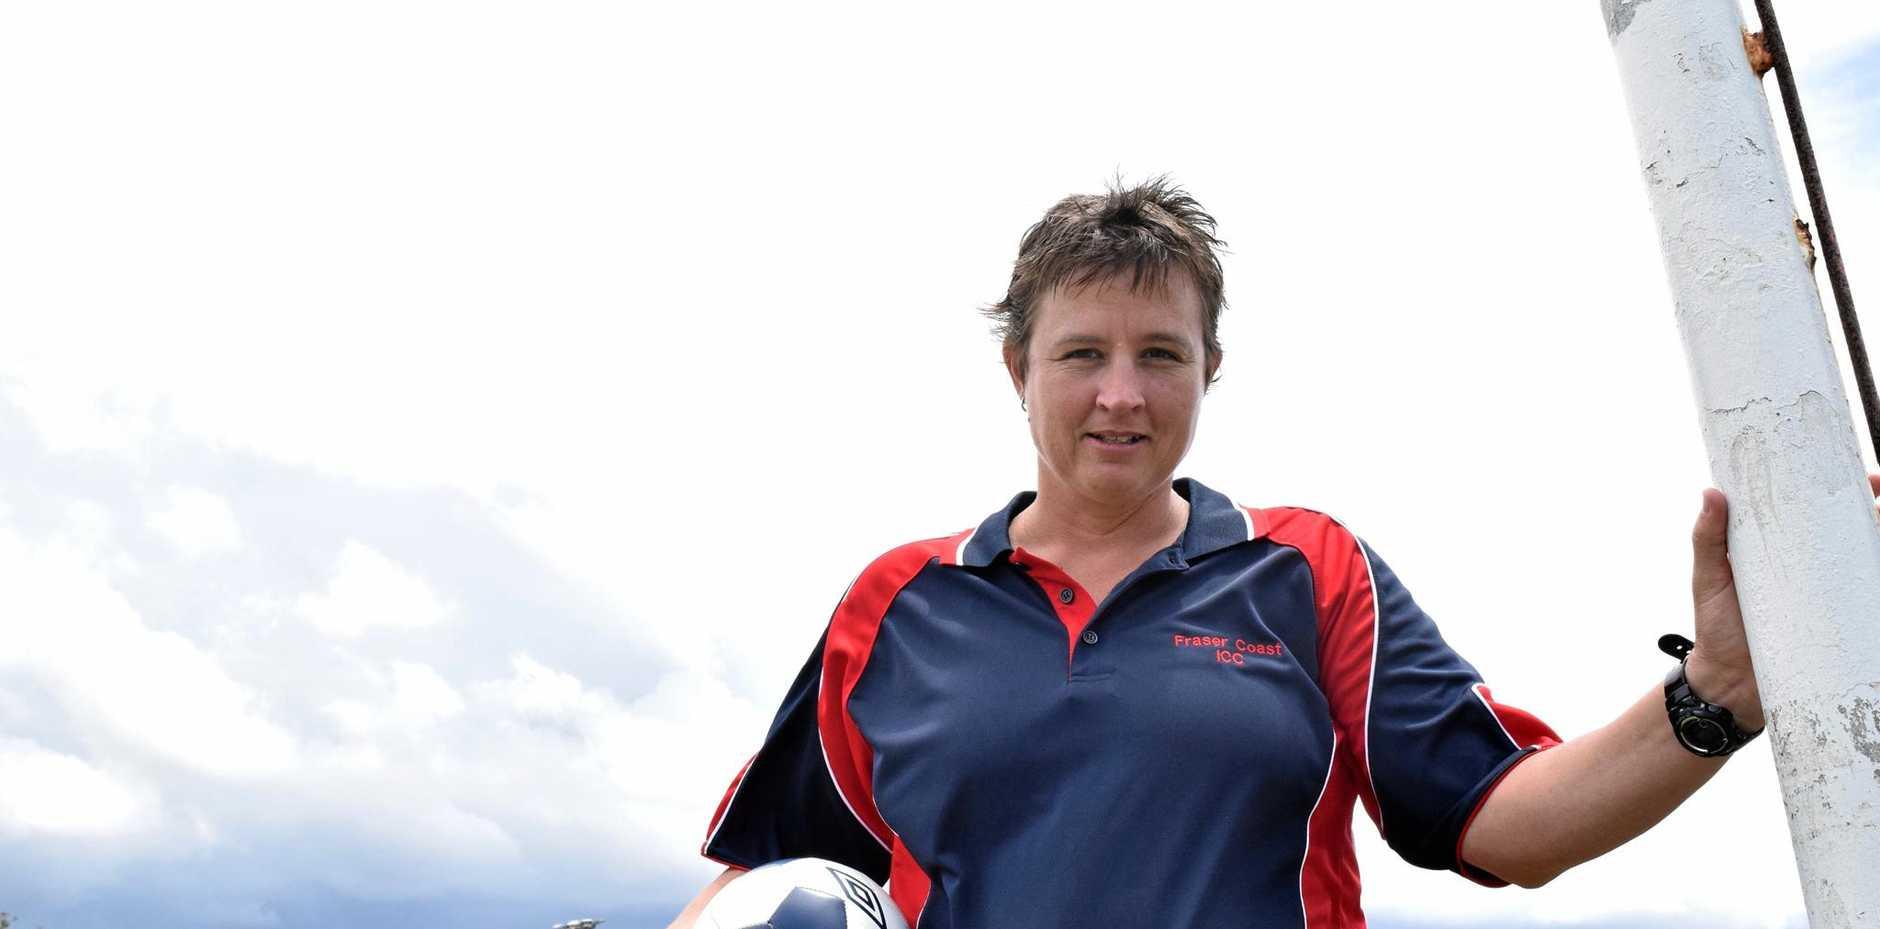 Former Matildas goalkeeper Belinda Kitching is returning to Ipswich to coach at Western Pride.